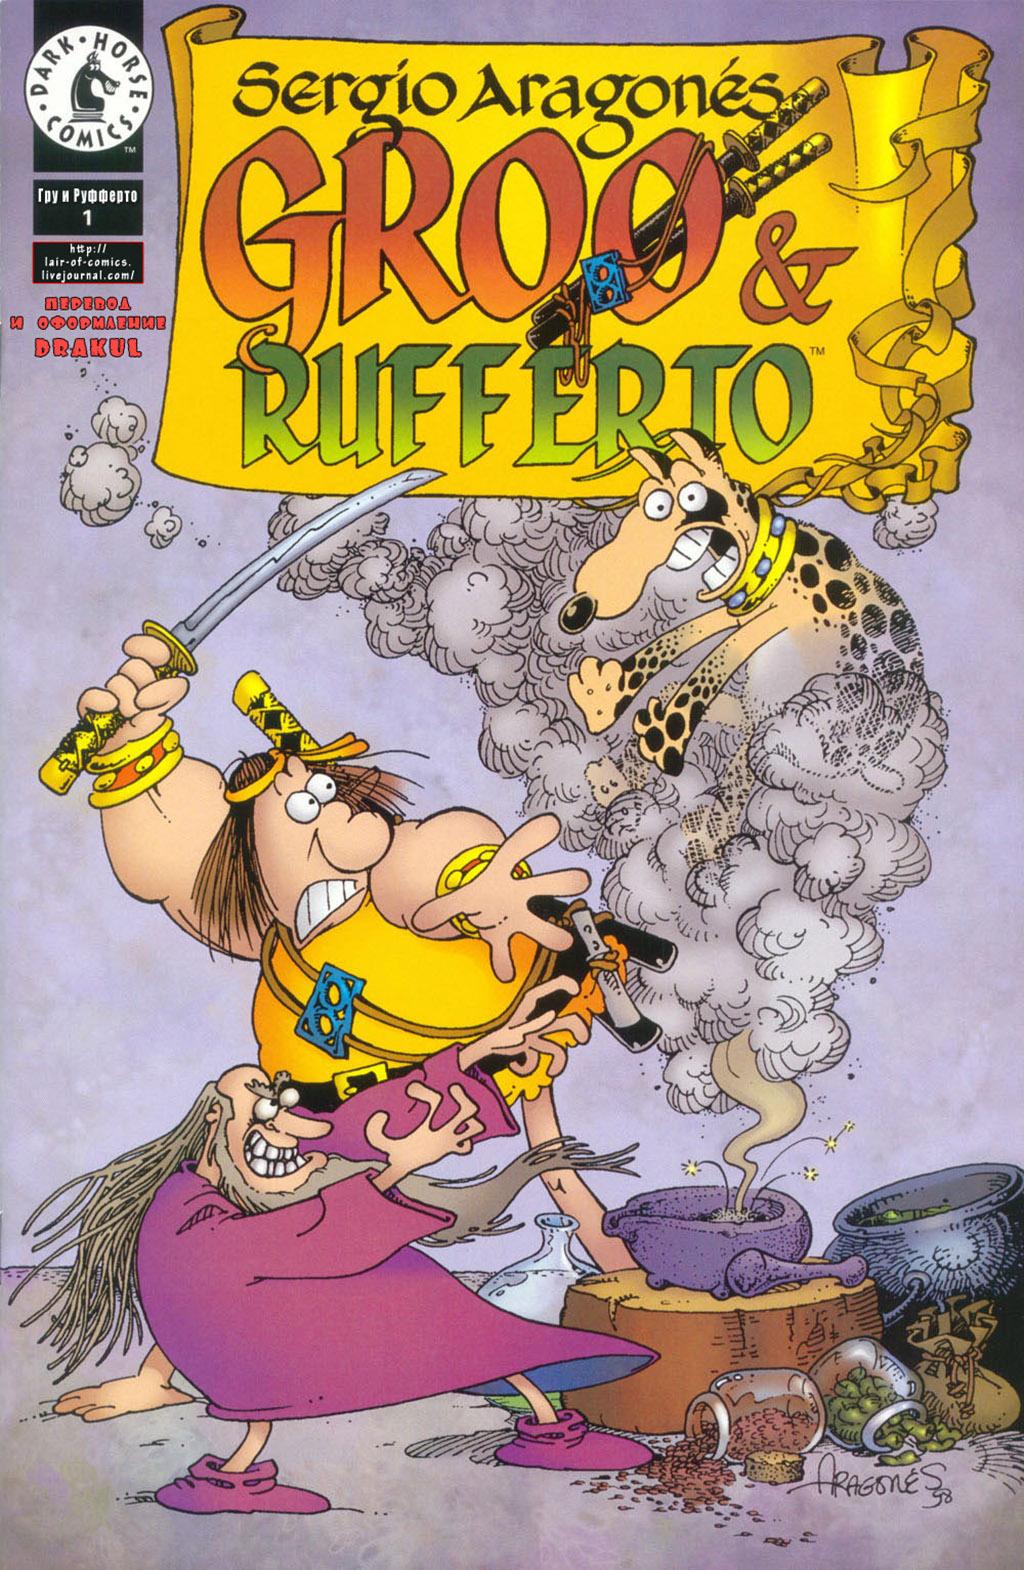 Комикс Серджо Арогонс: Гру и Руфферто